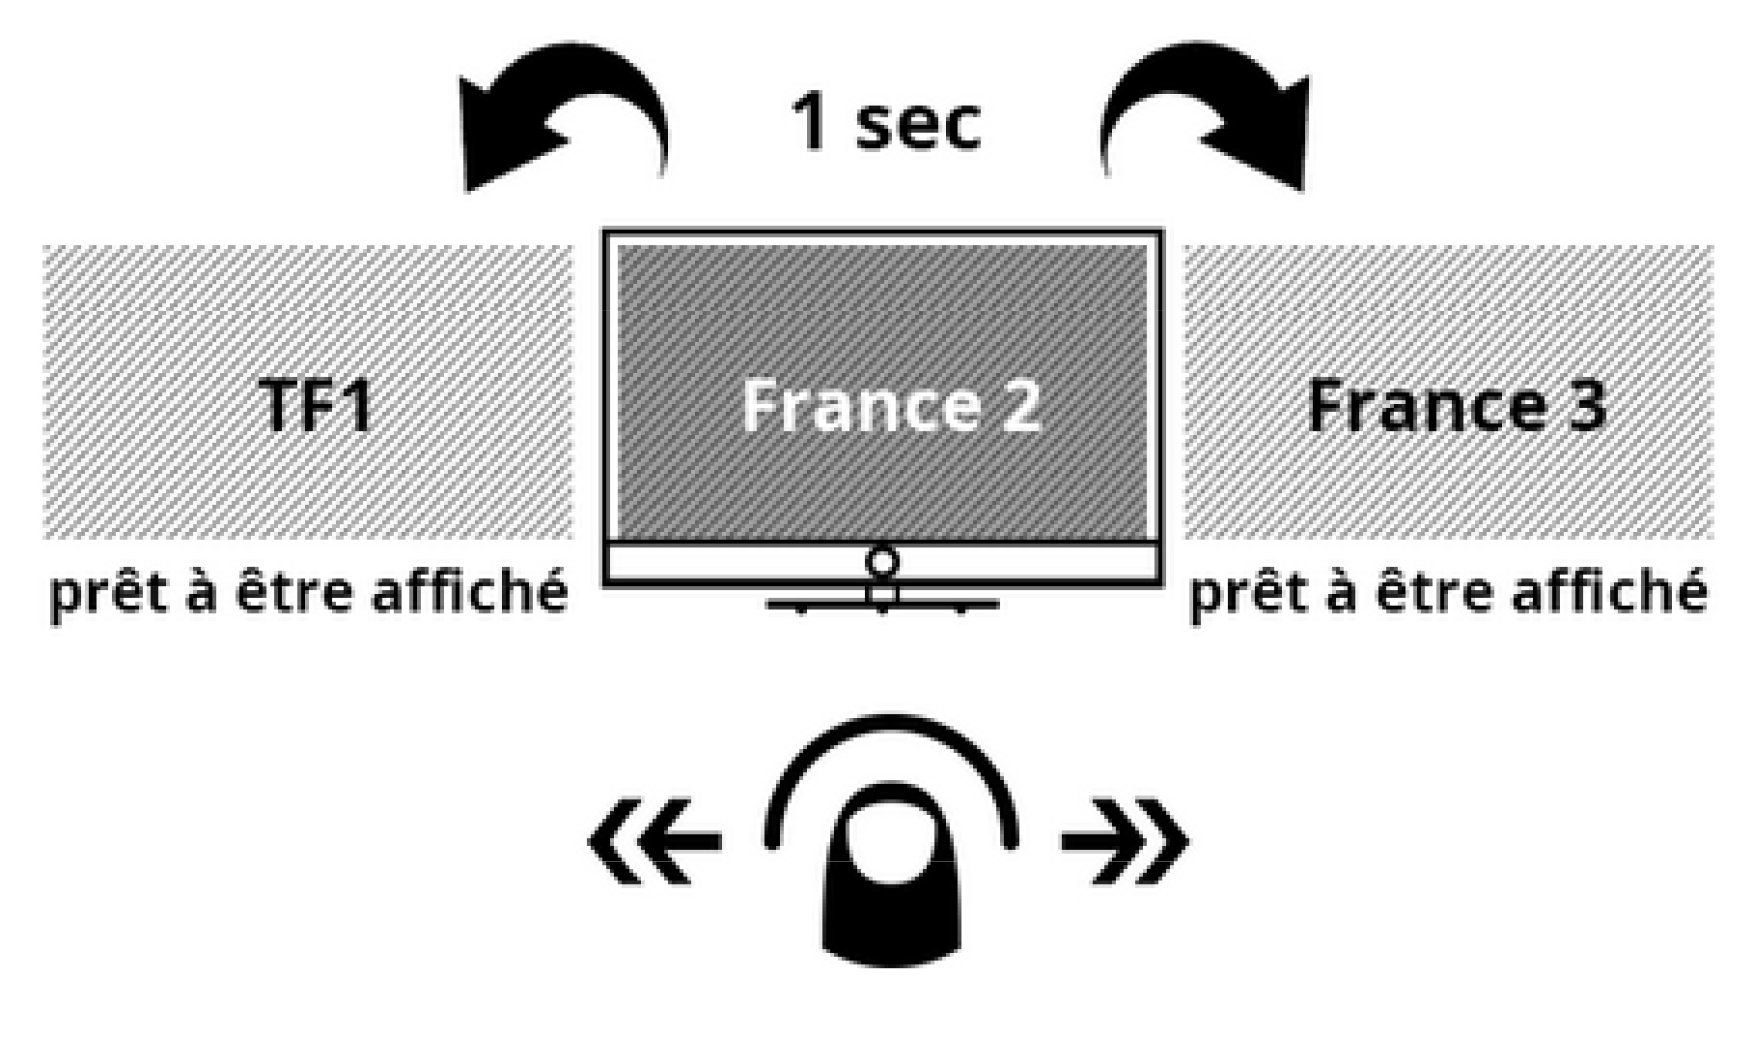 Loewe instant Channel Changement rapide des chaînes. Loewe one 55 UHD controlsound